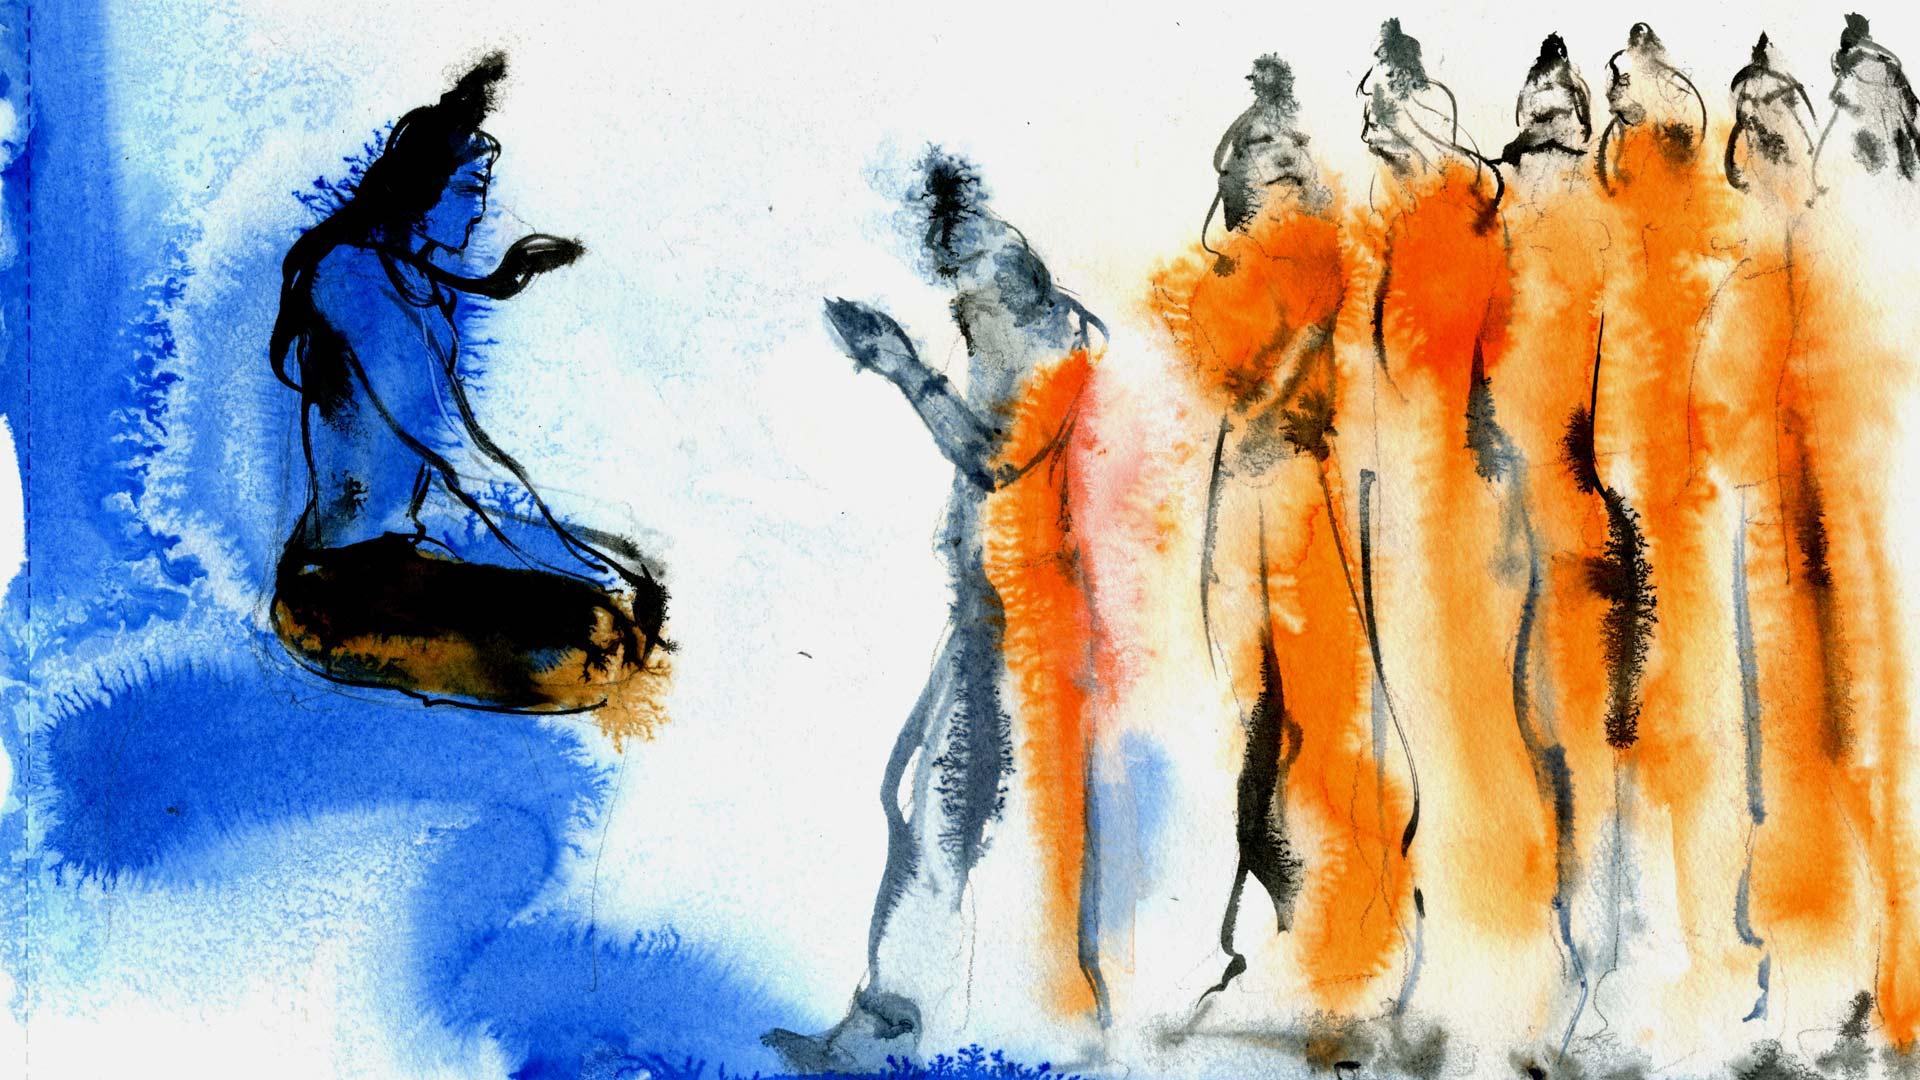 guru purnima: giving thanks to teachers